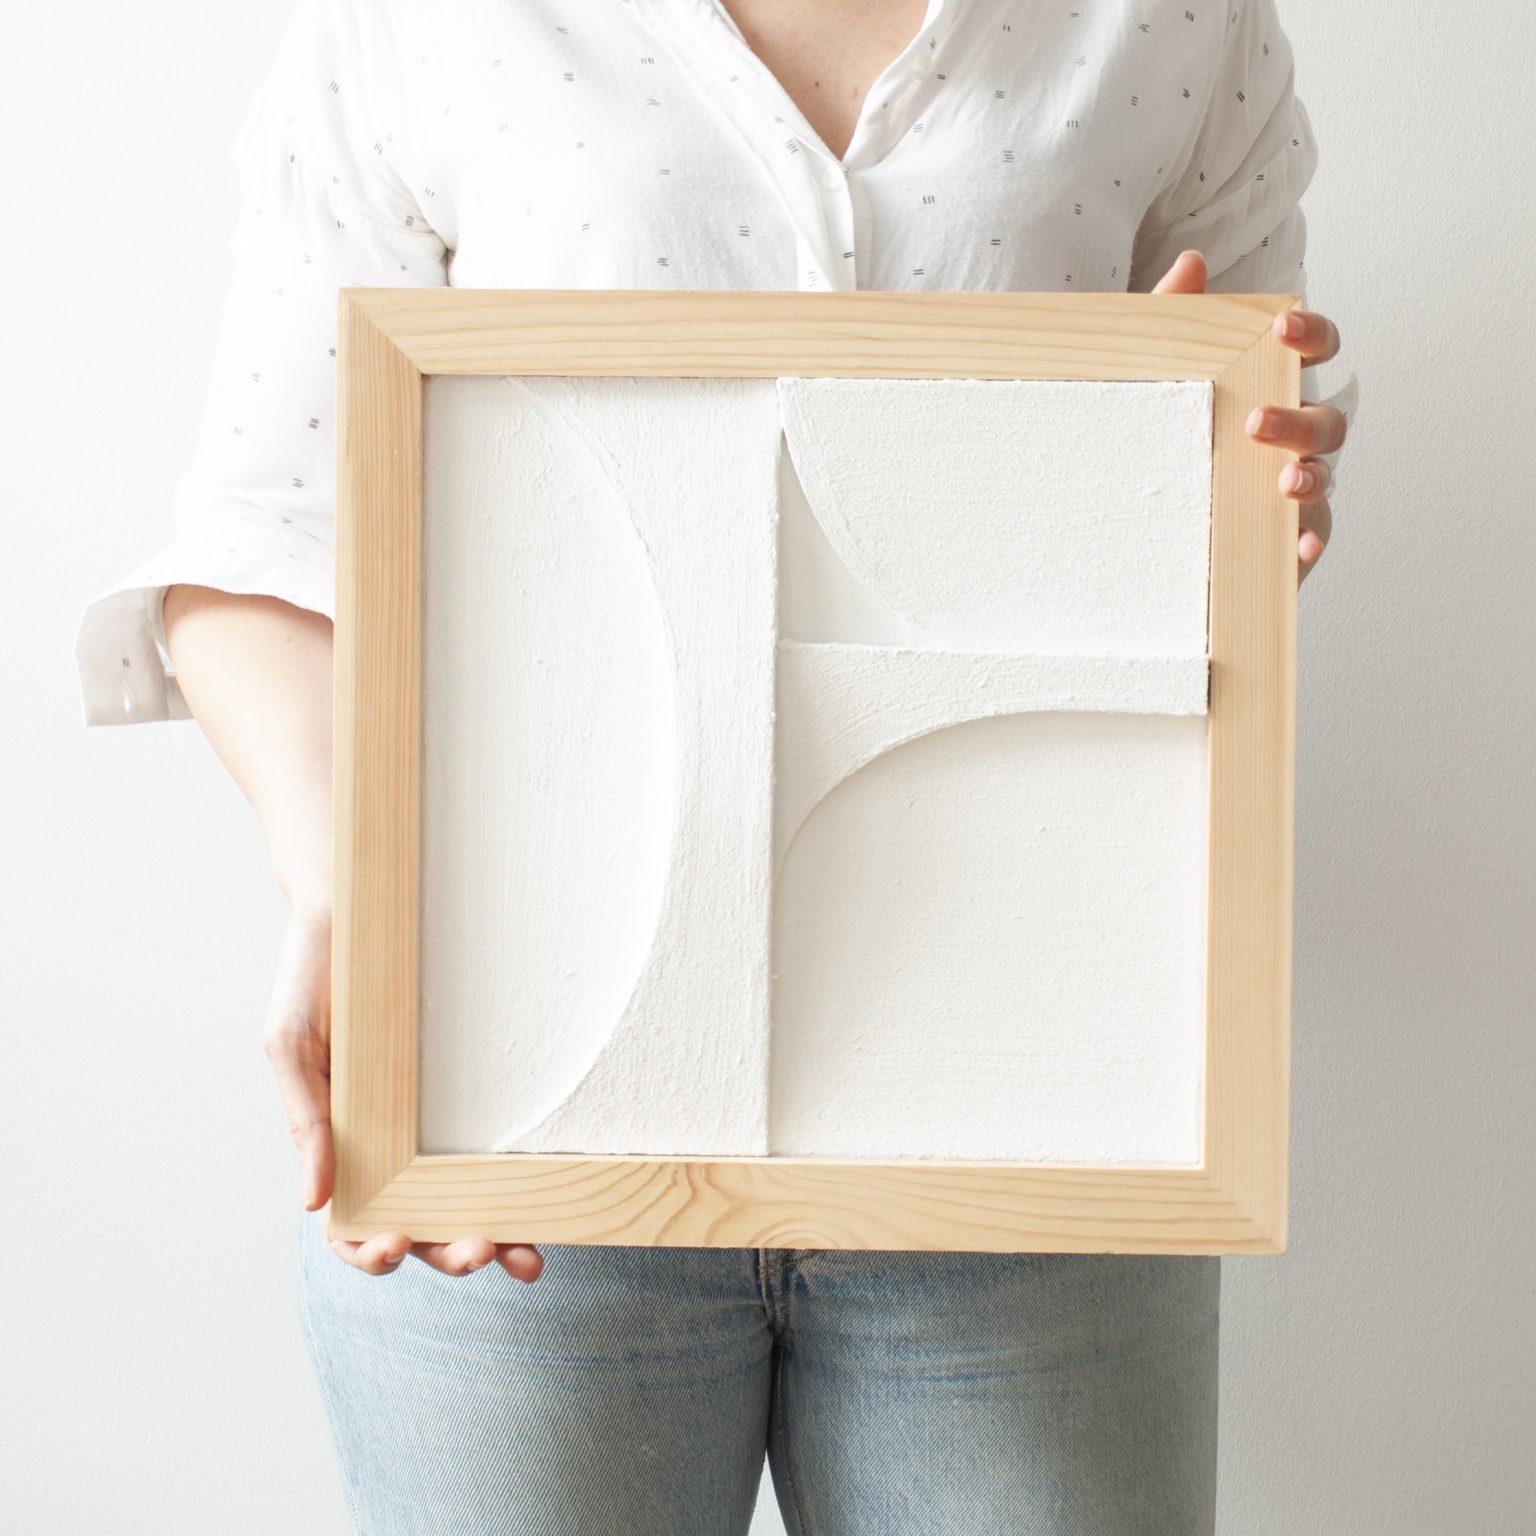 LIMITED EDITION: DIY-PAKKET 3D RELIËF SCHILDERIJ